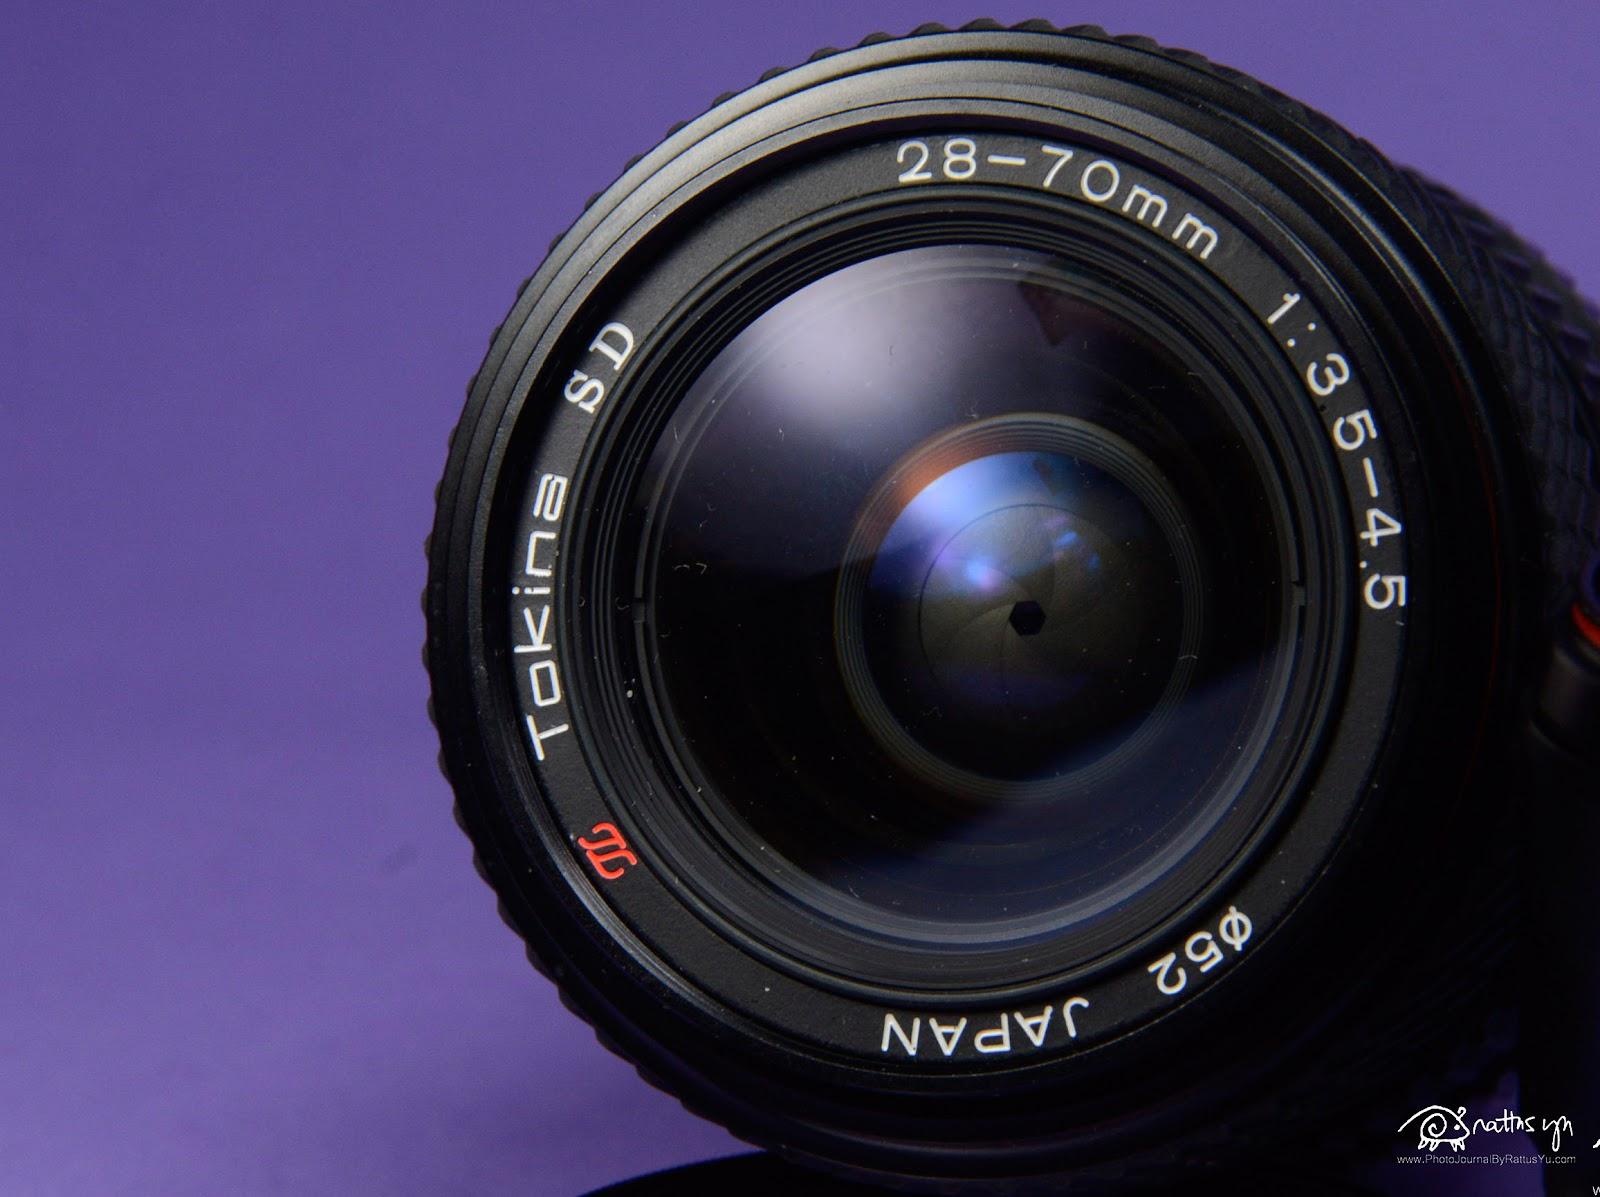 Tokina SD 28-70mm f/3.5-4.5 Macro (Manual Version)